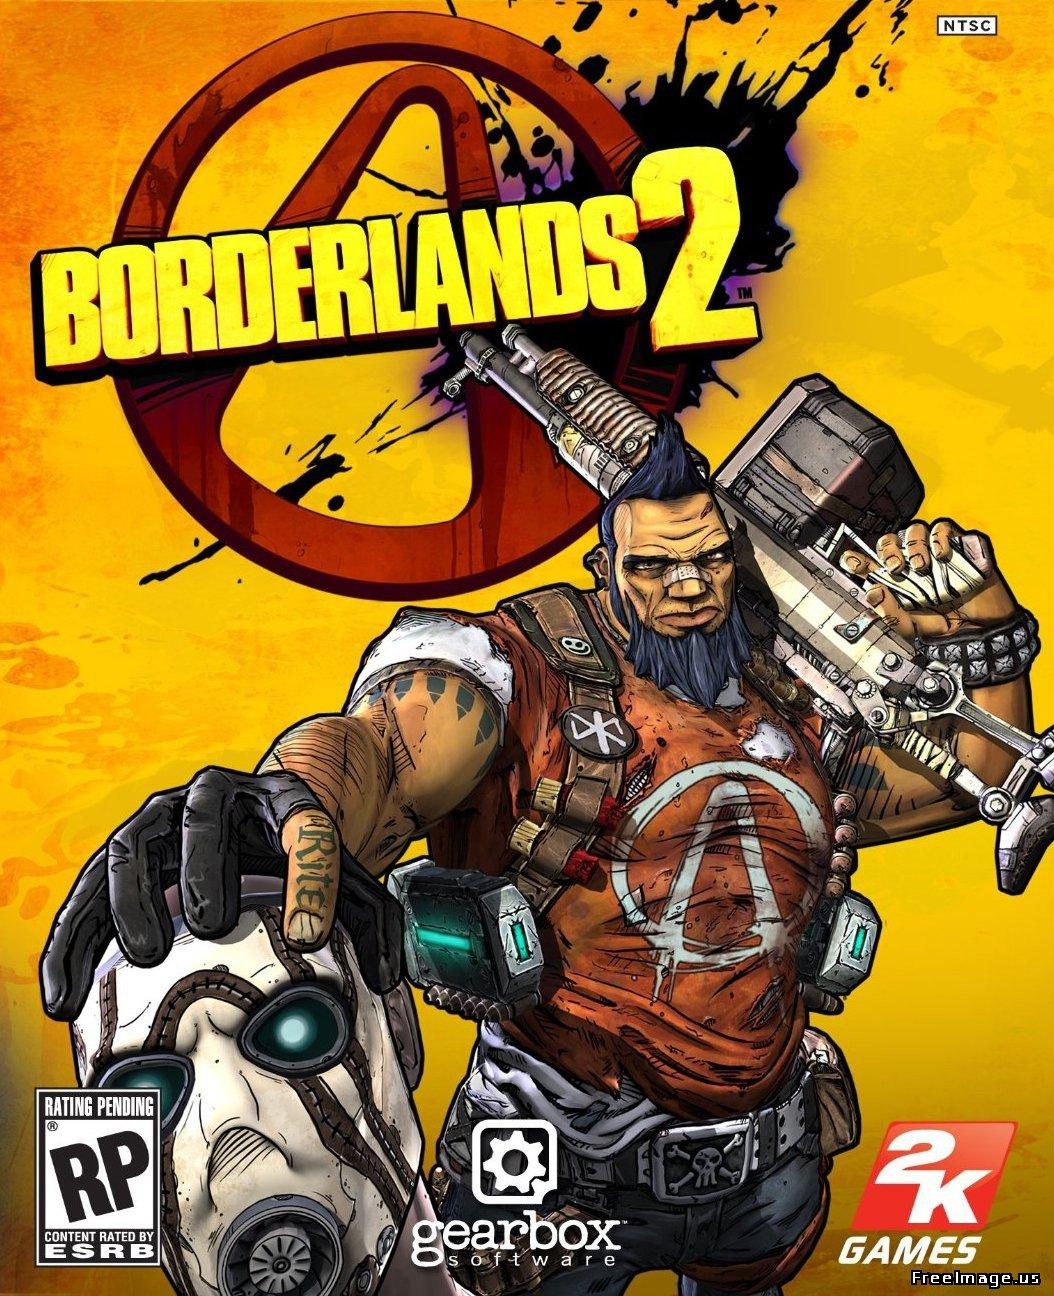 Borderlands 2 Xbox 360 Game Free Download |Free Download Games Xbox 360 Game Covers Download